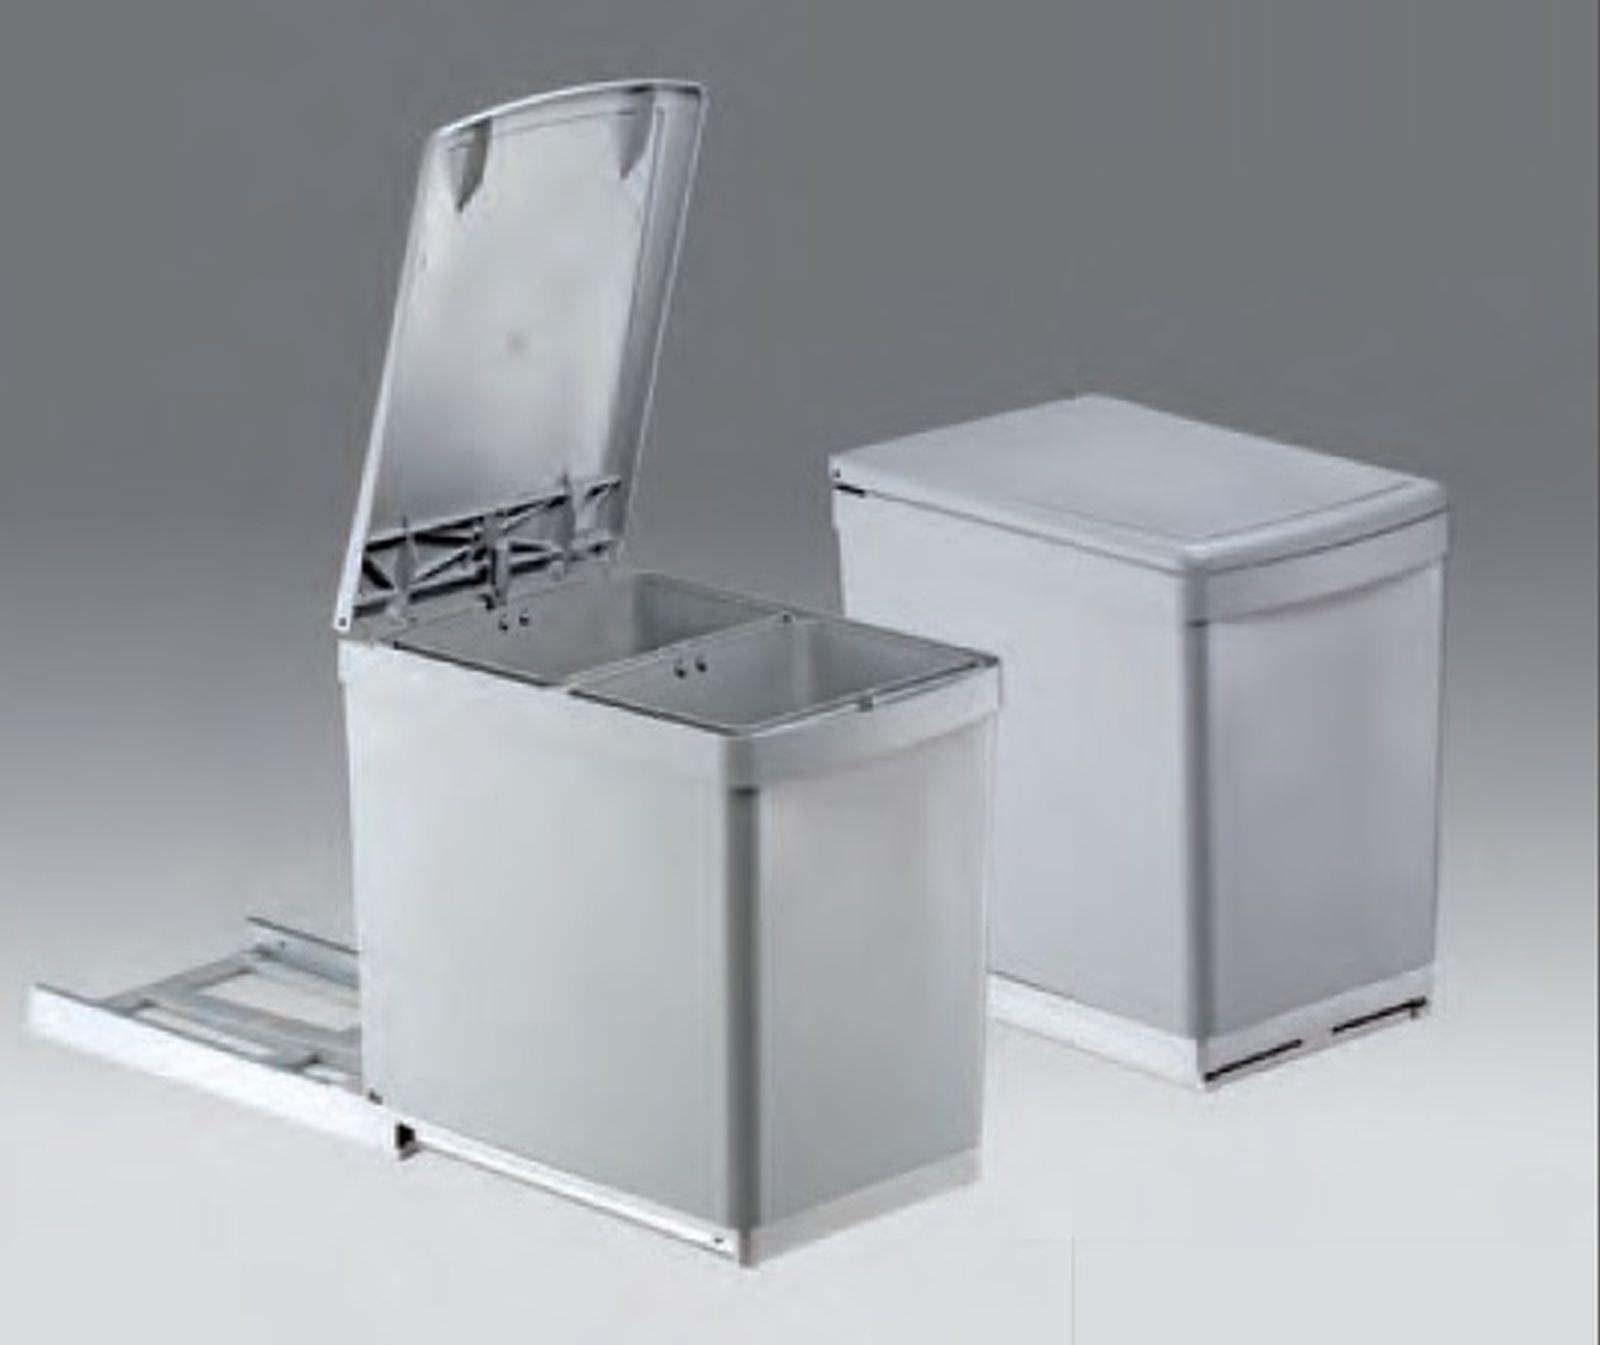 Wesco Basic-2 Küchen Abfall Mülleimer 2 x 7, 5 L Vollauszug 30 cm ...